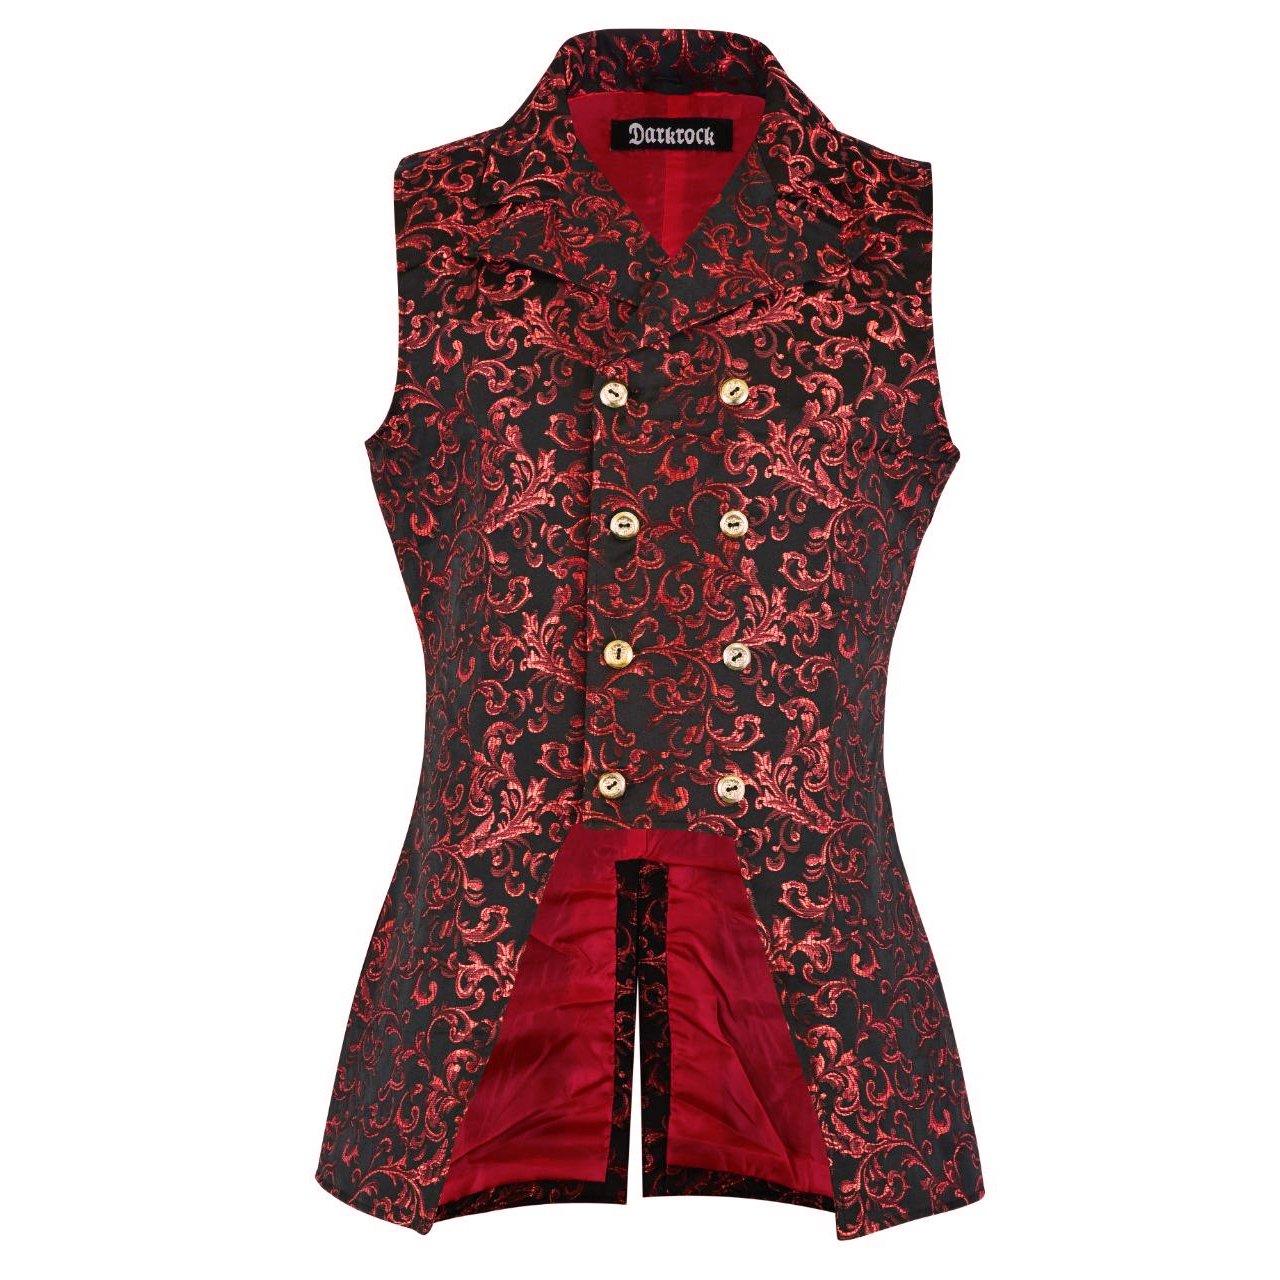 DARKROCK Double Breasted GOVERNOR Vest Waistcoat VTG Brocade Gothic Red Velvet (front)